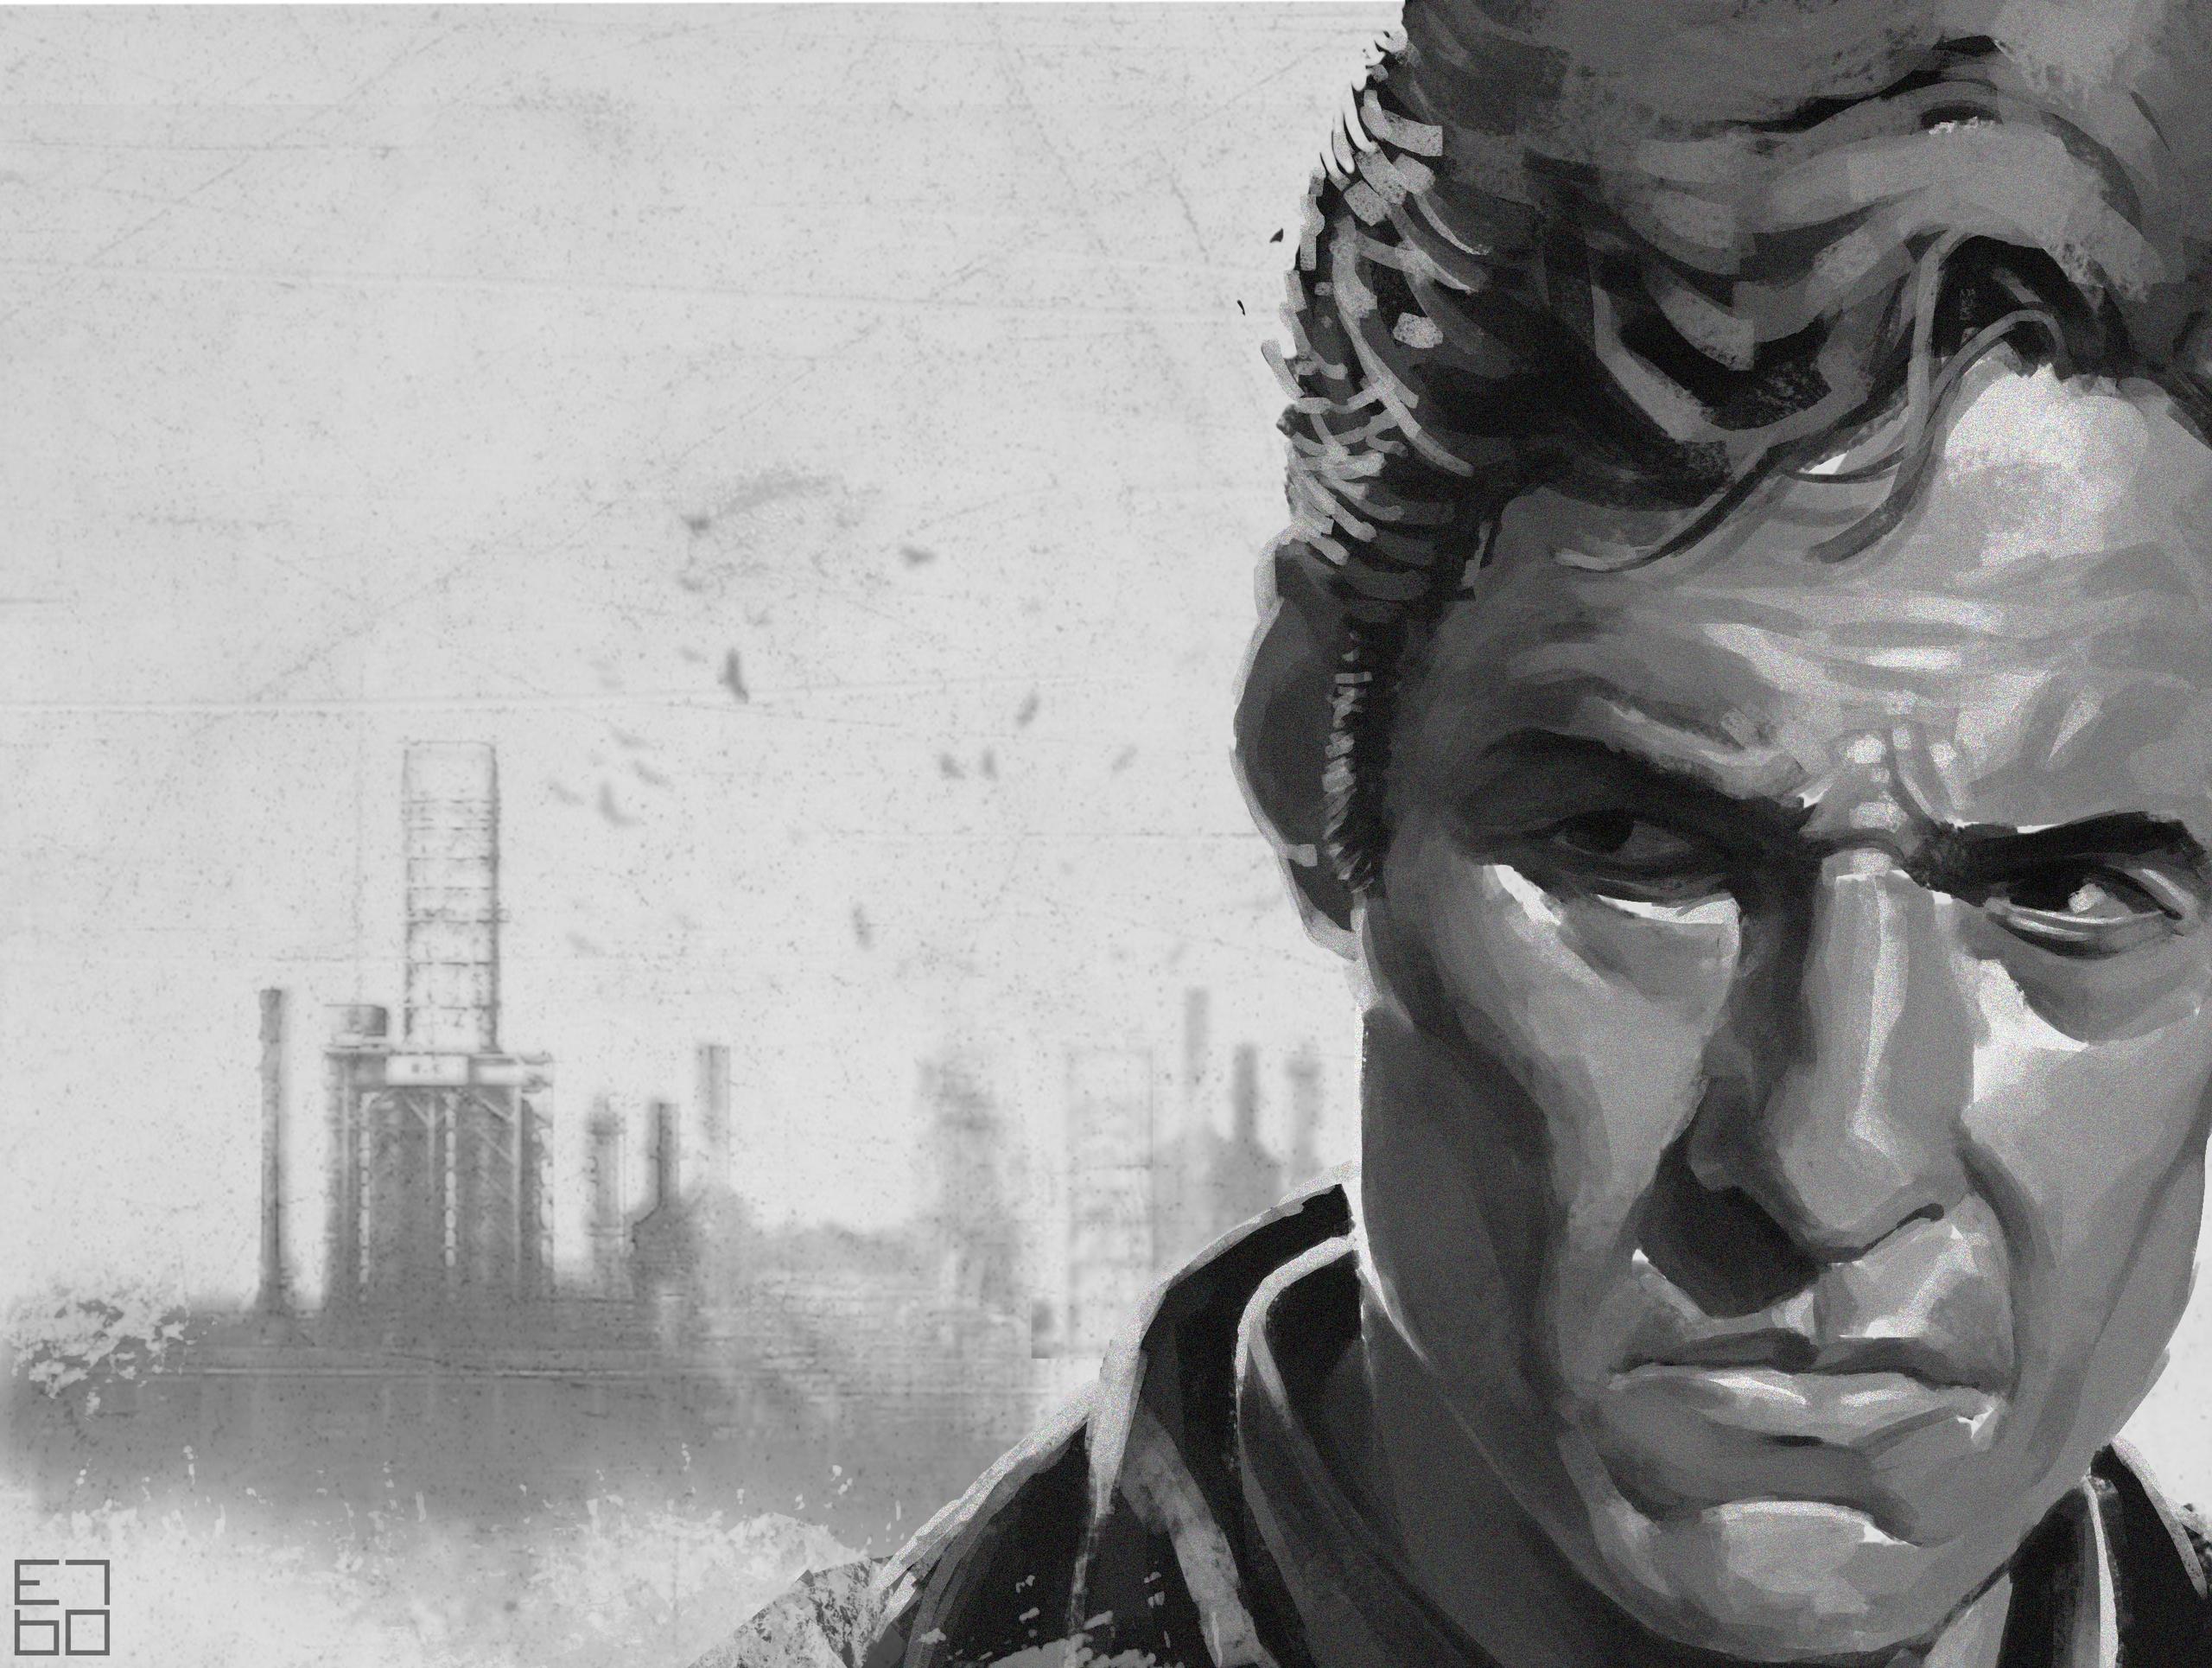 Rust true detective fan art - illustration - grositskiy | ello